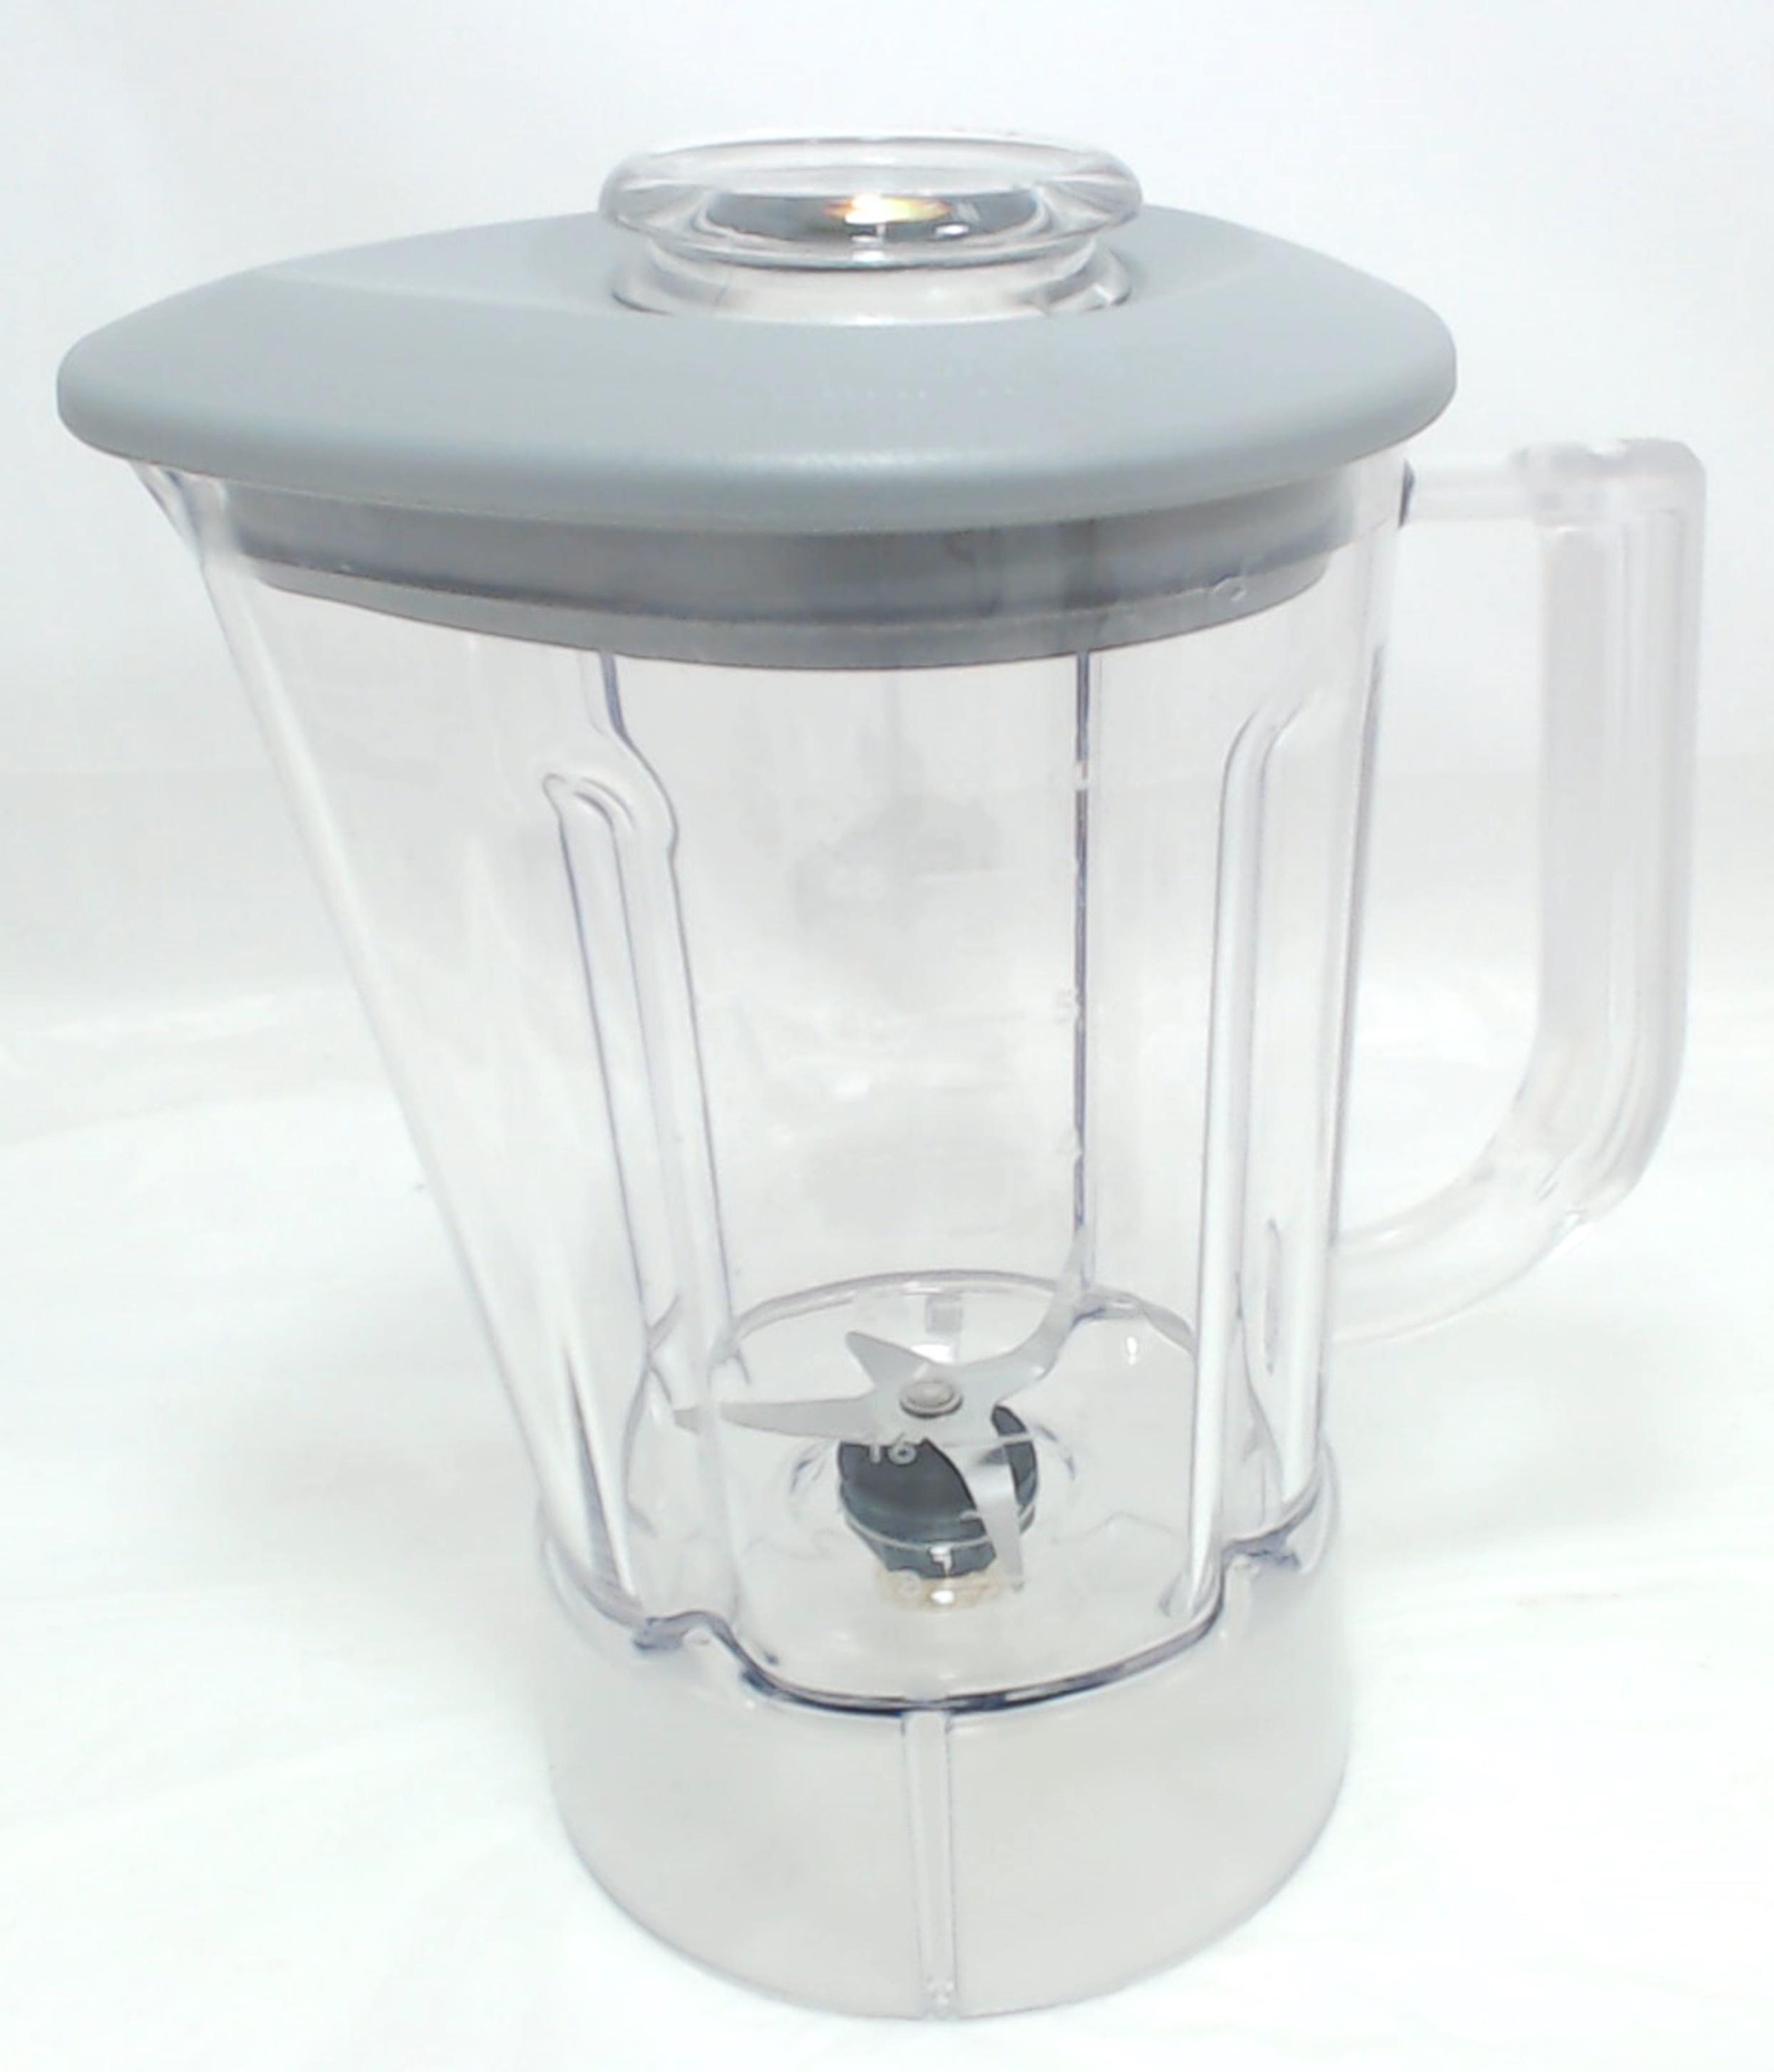 blender pitcher with grey lid ksb48pel brand new kitchenaid blender